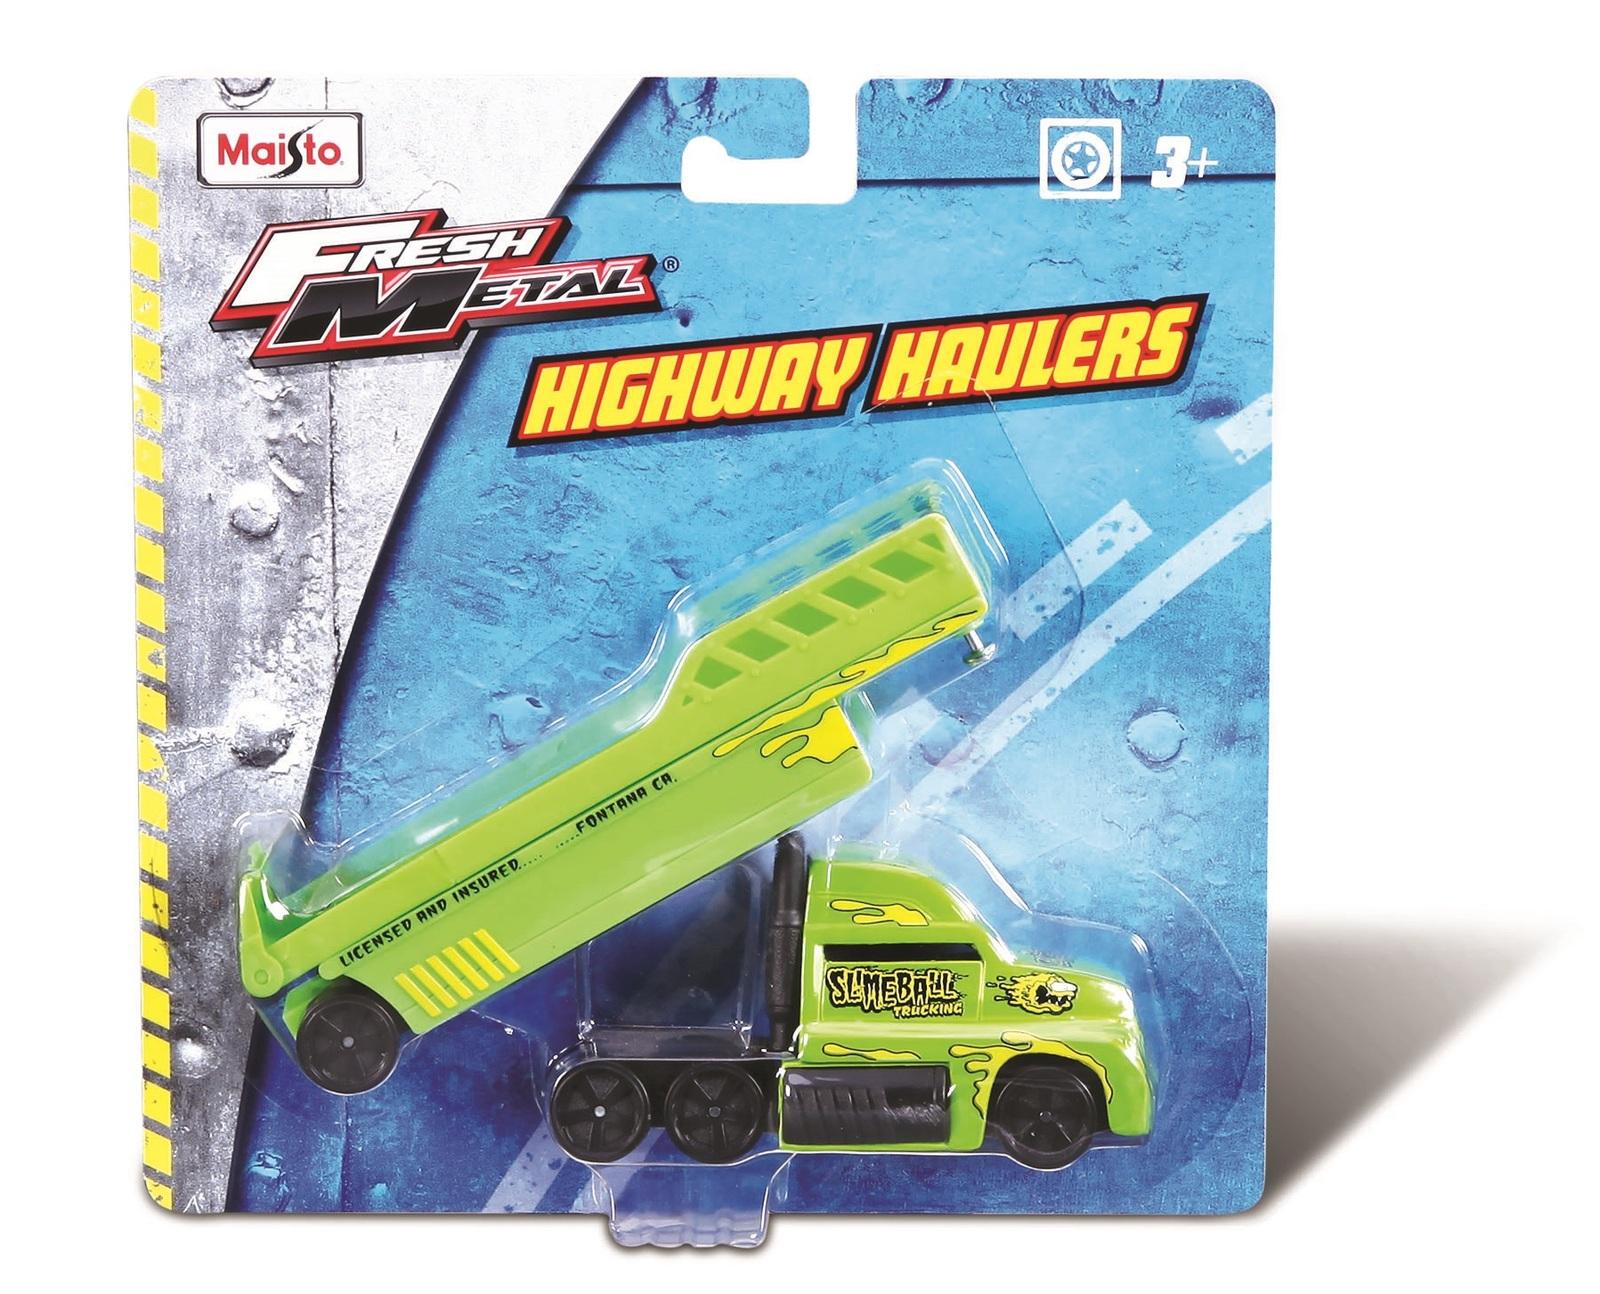 Maisto: Fresh Metal - Highway Haulers (Assorted Designs) image